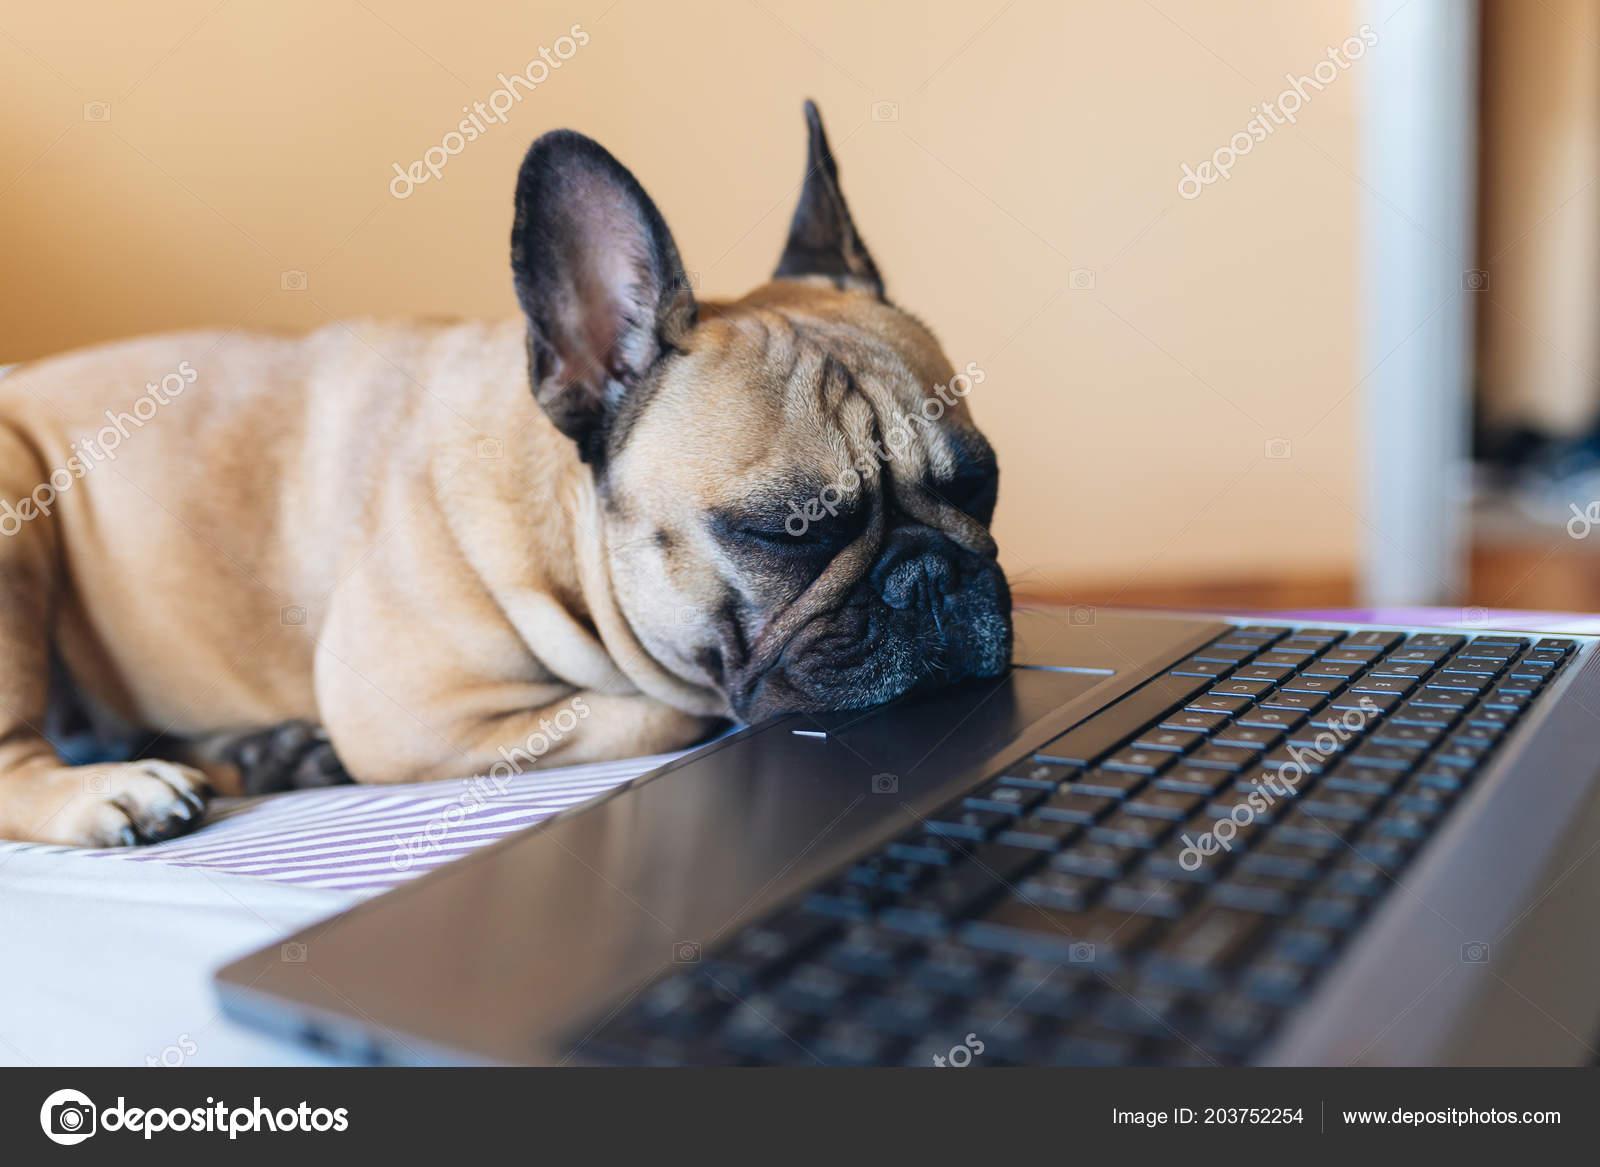 Cute French Bulldog Puppy Sleeping Bed Next Laptop Stock Photo C Nenadovicphoto Gmail Com 203752254